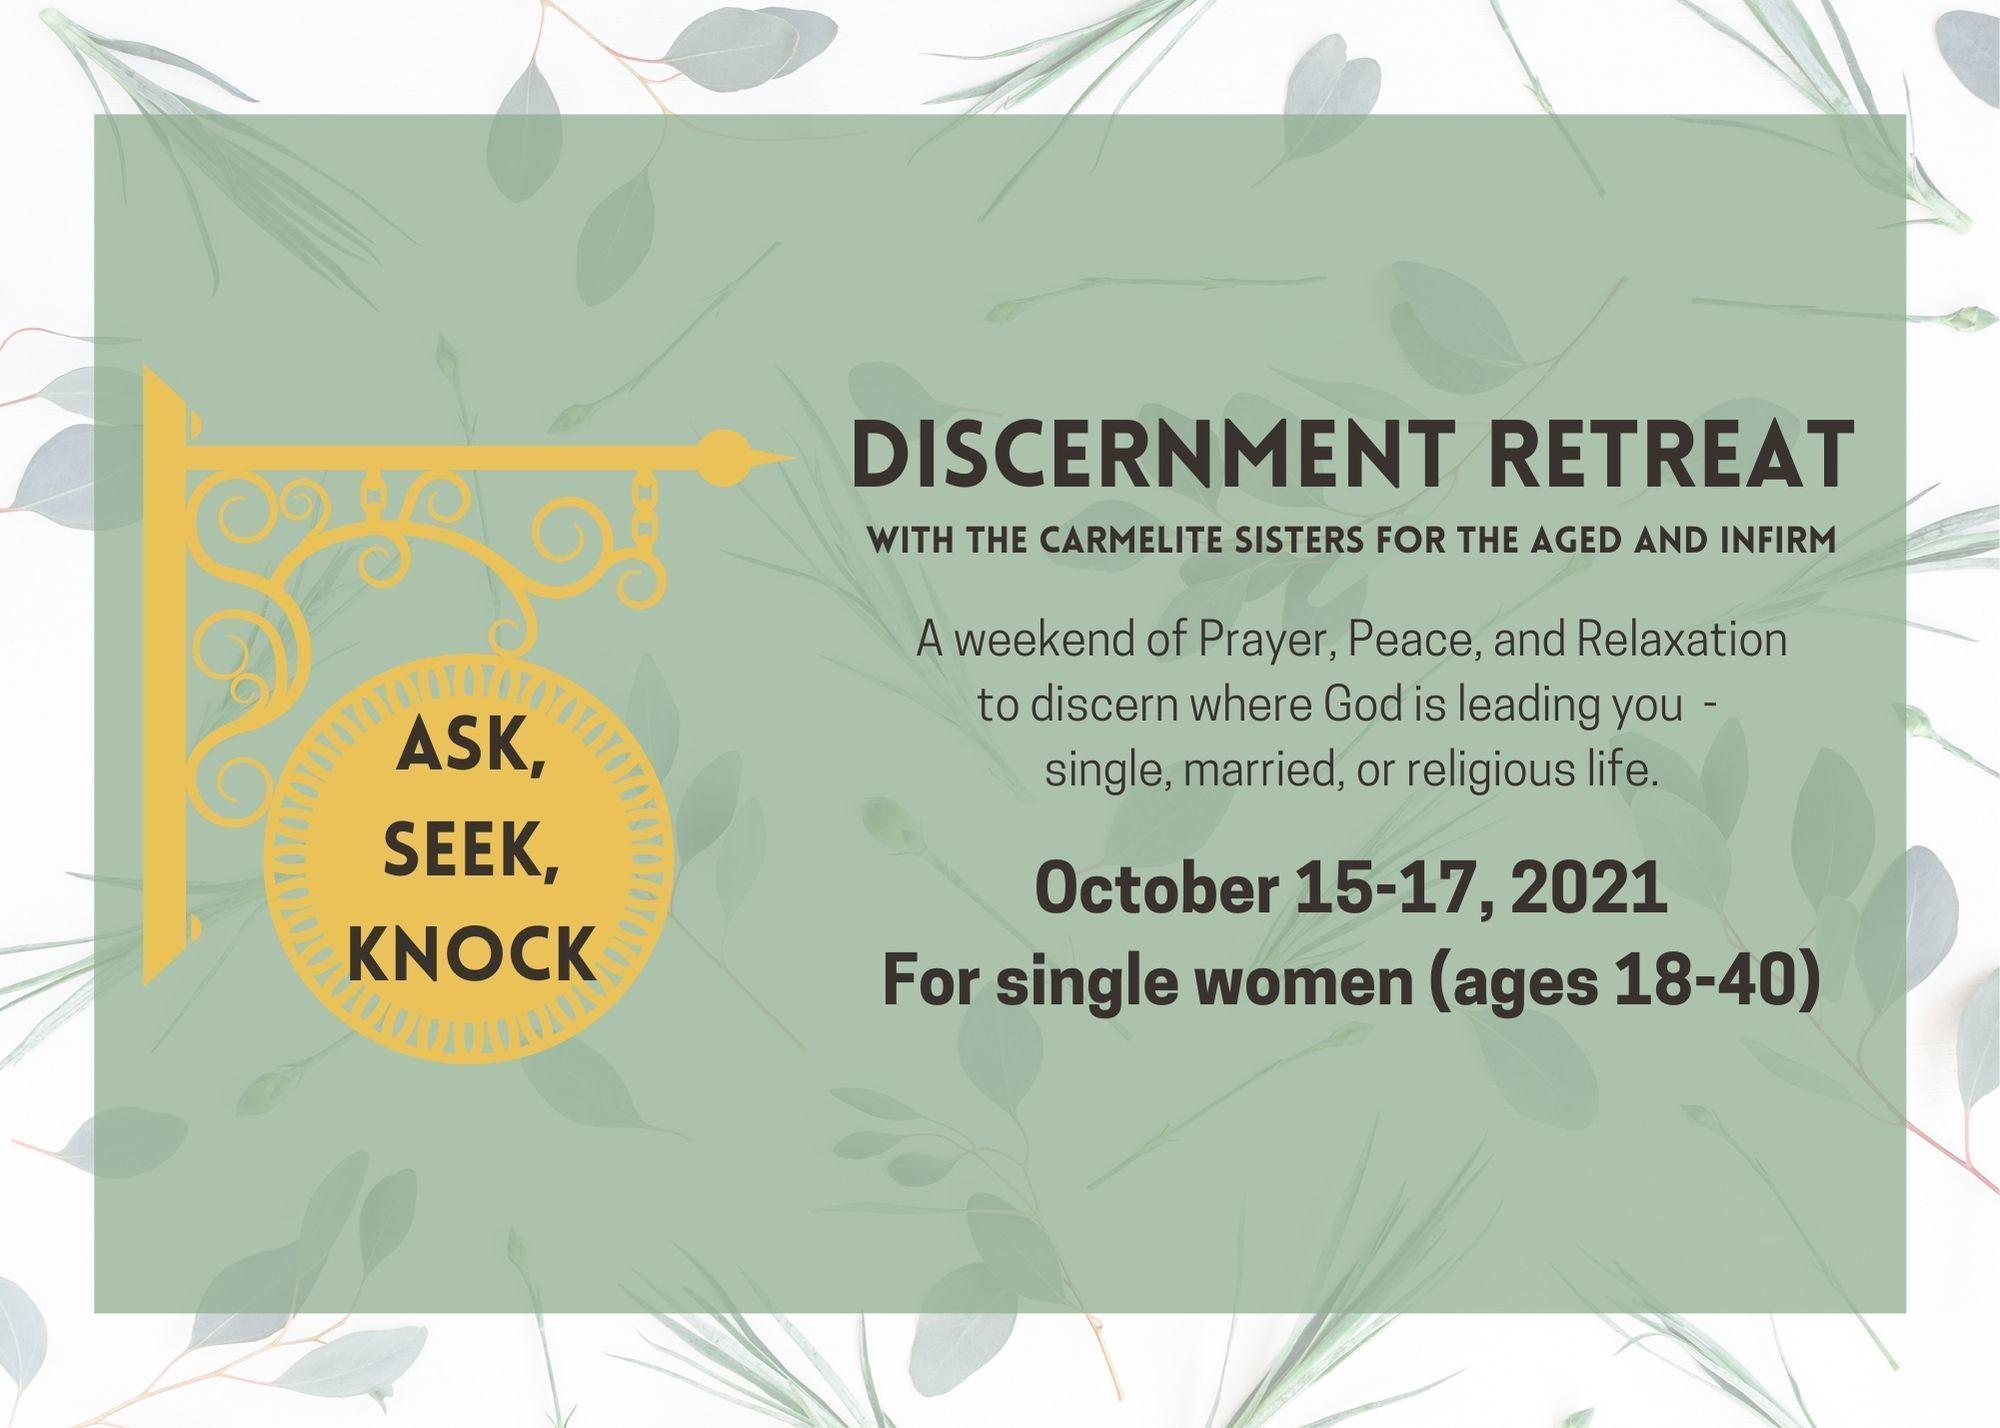 Upcoming Discernment Retreat